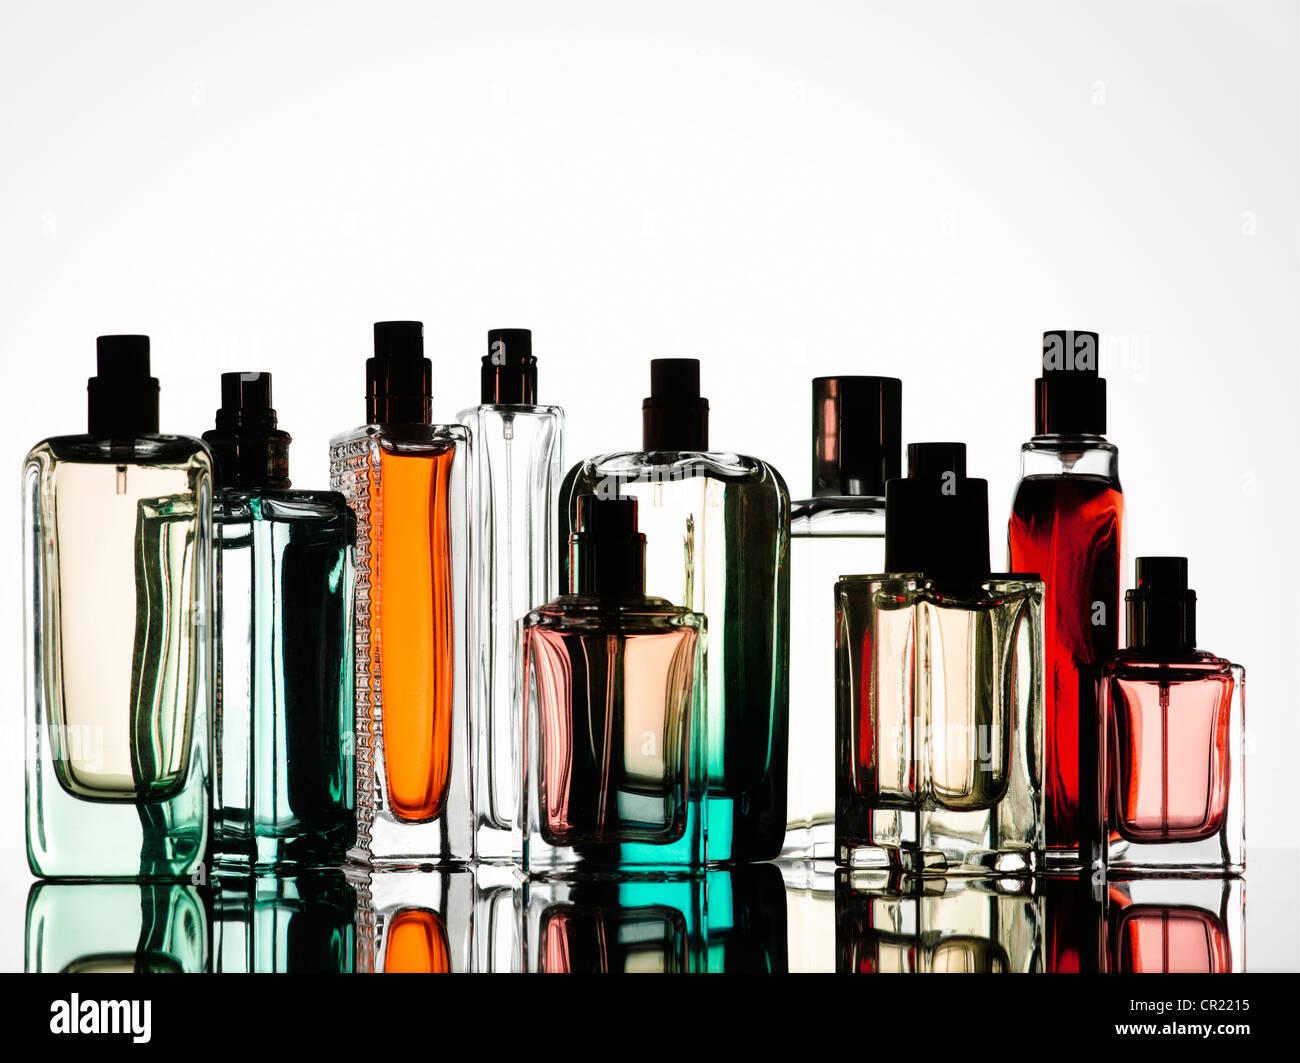 Close up of perfume bottles - Stock Image